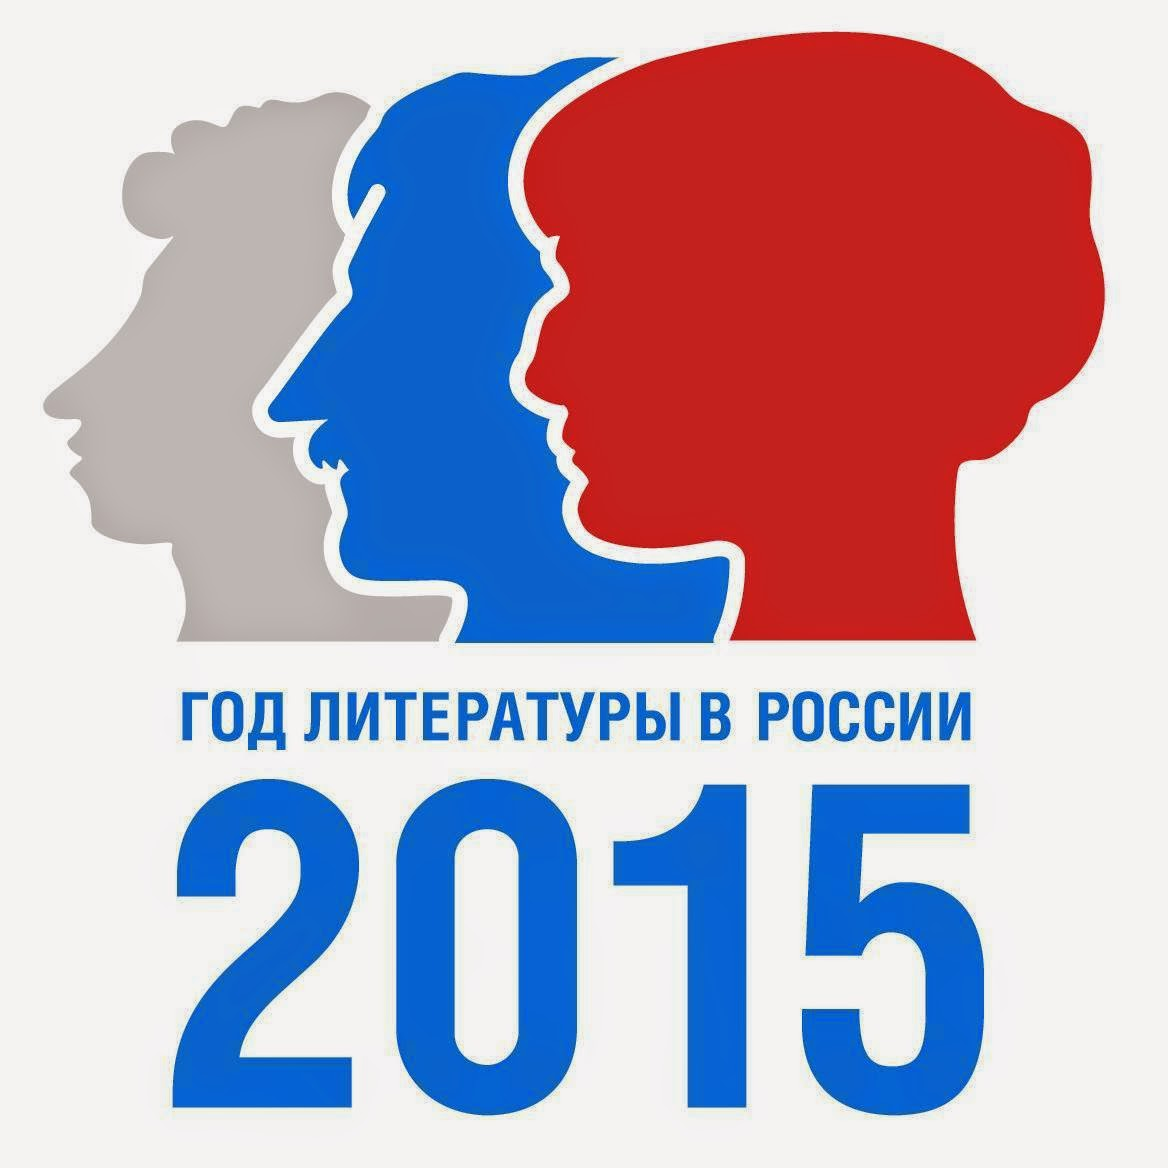 2015 - год Литературы